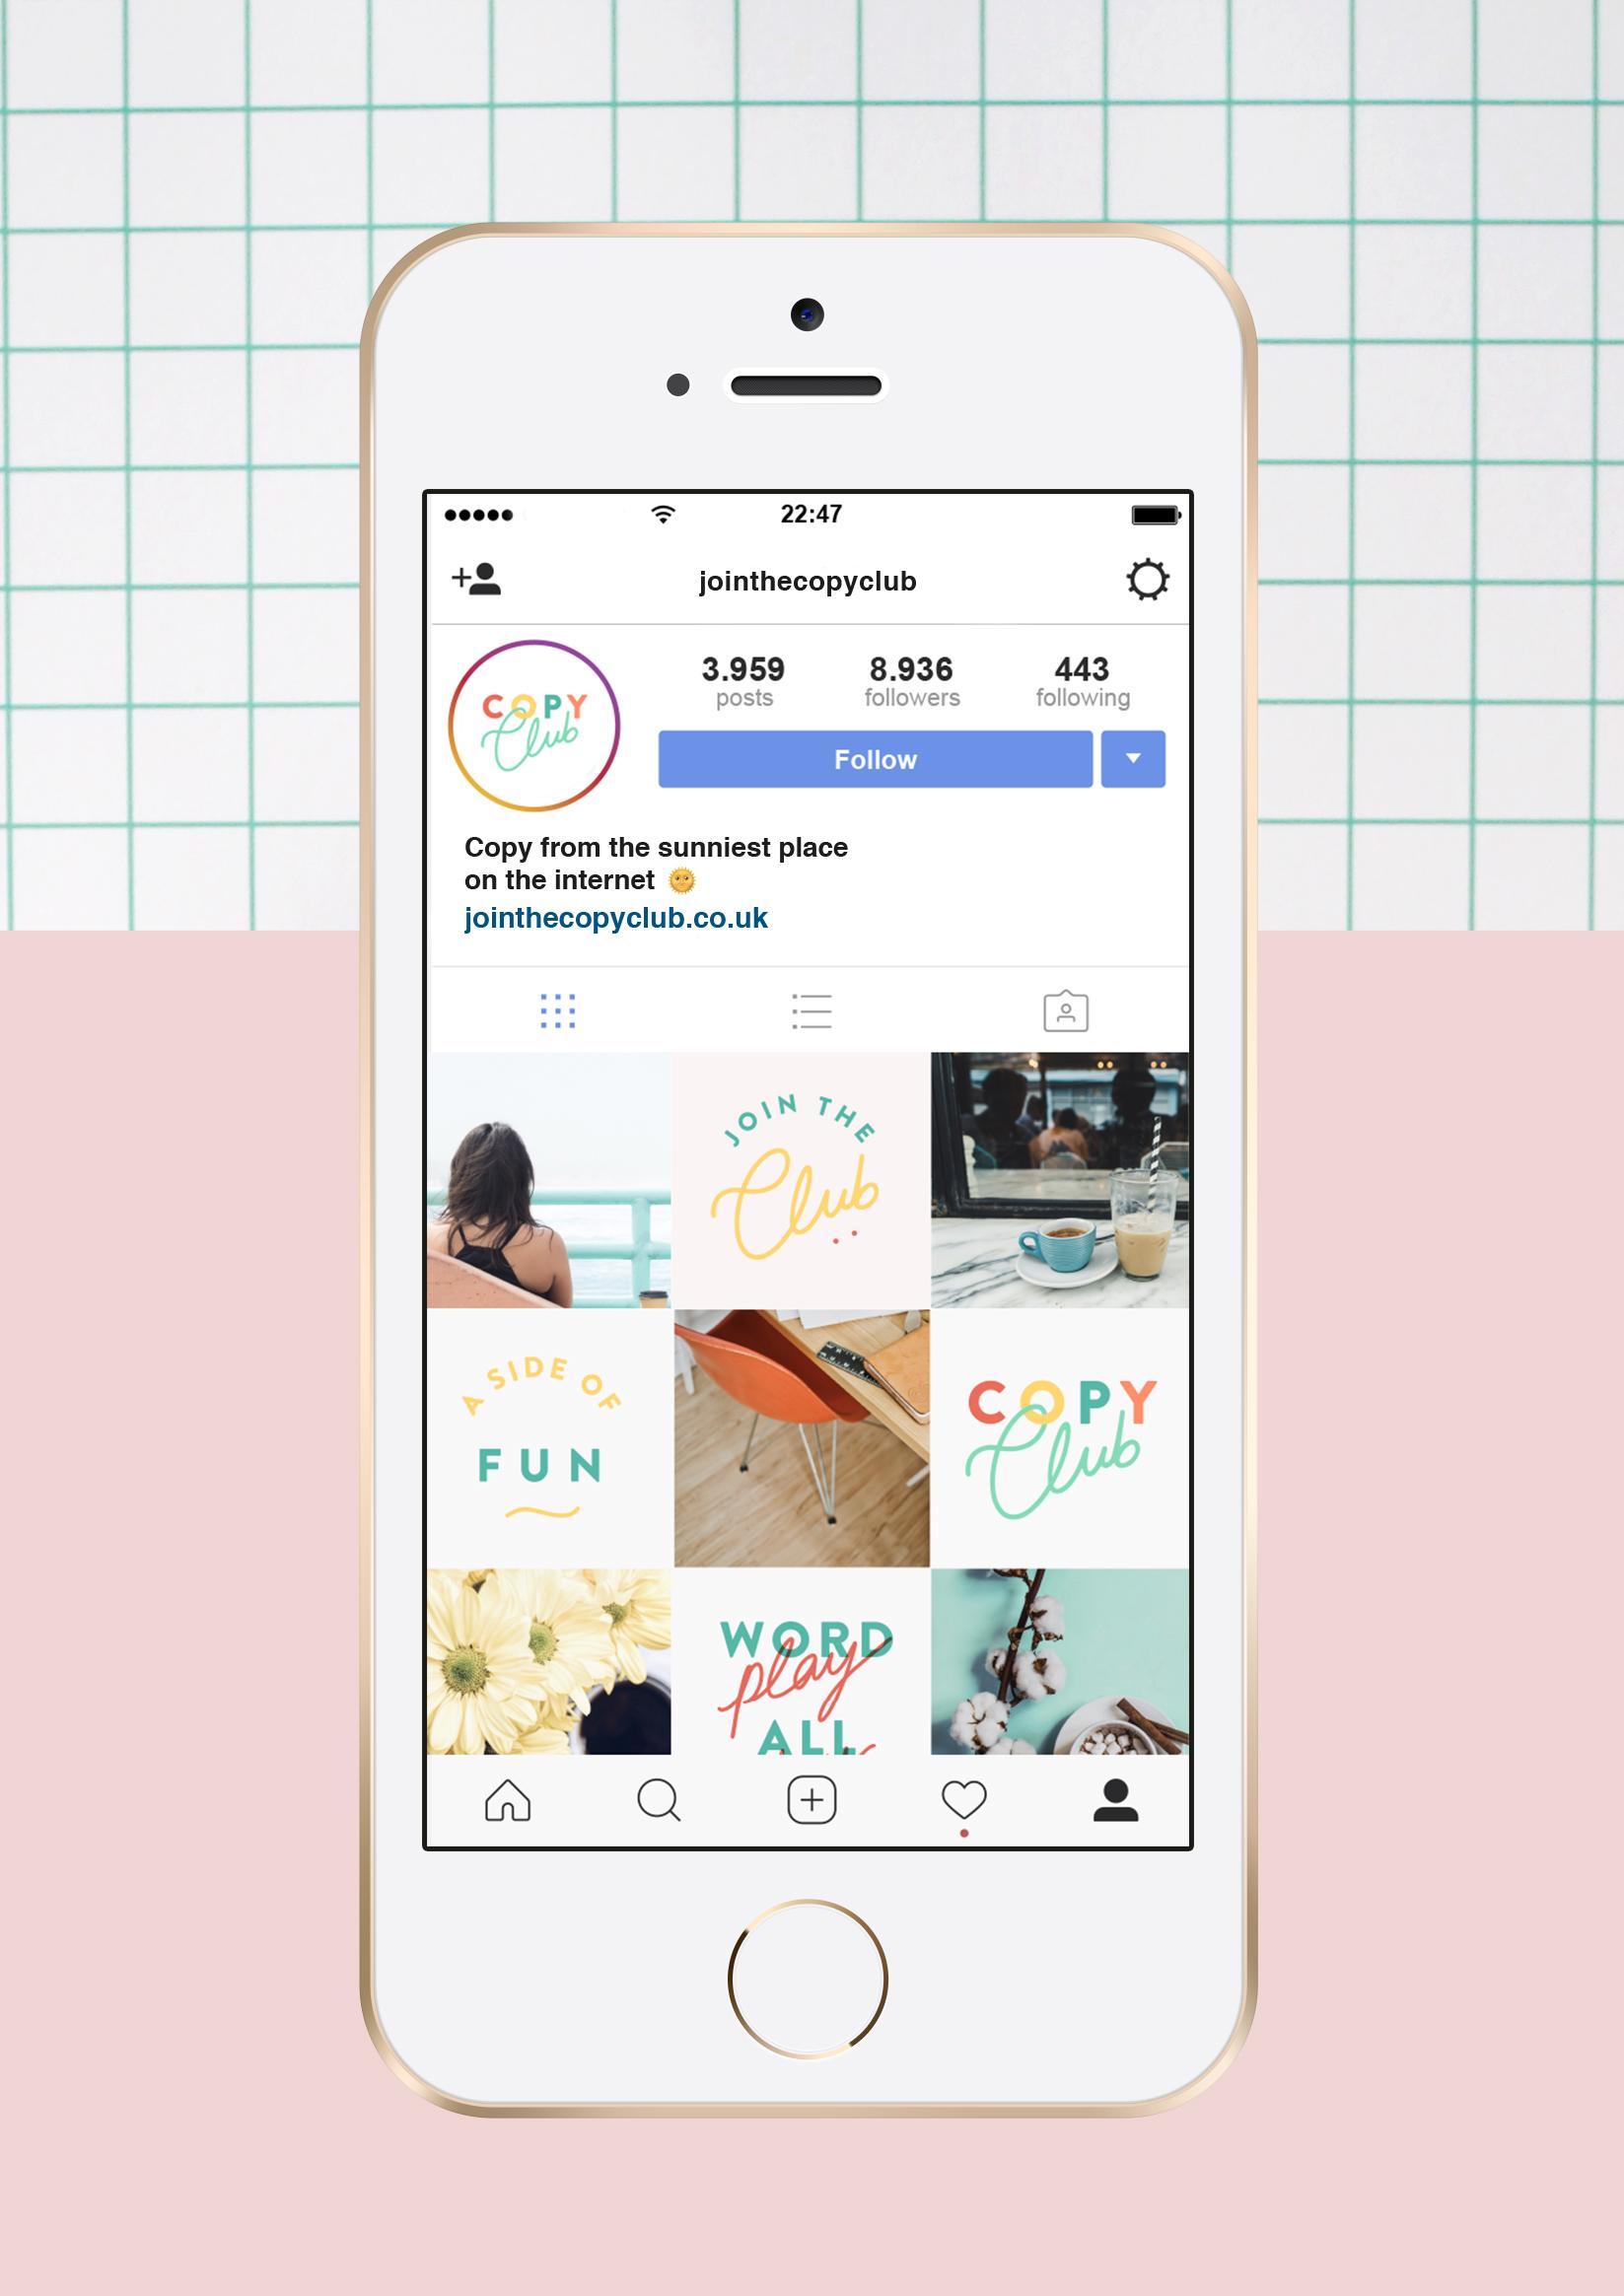 copy-club-instagram-iphone.jpg